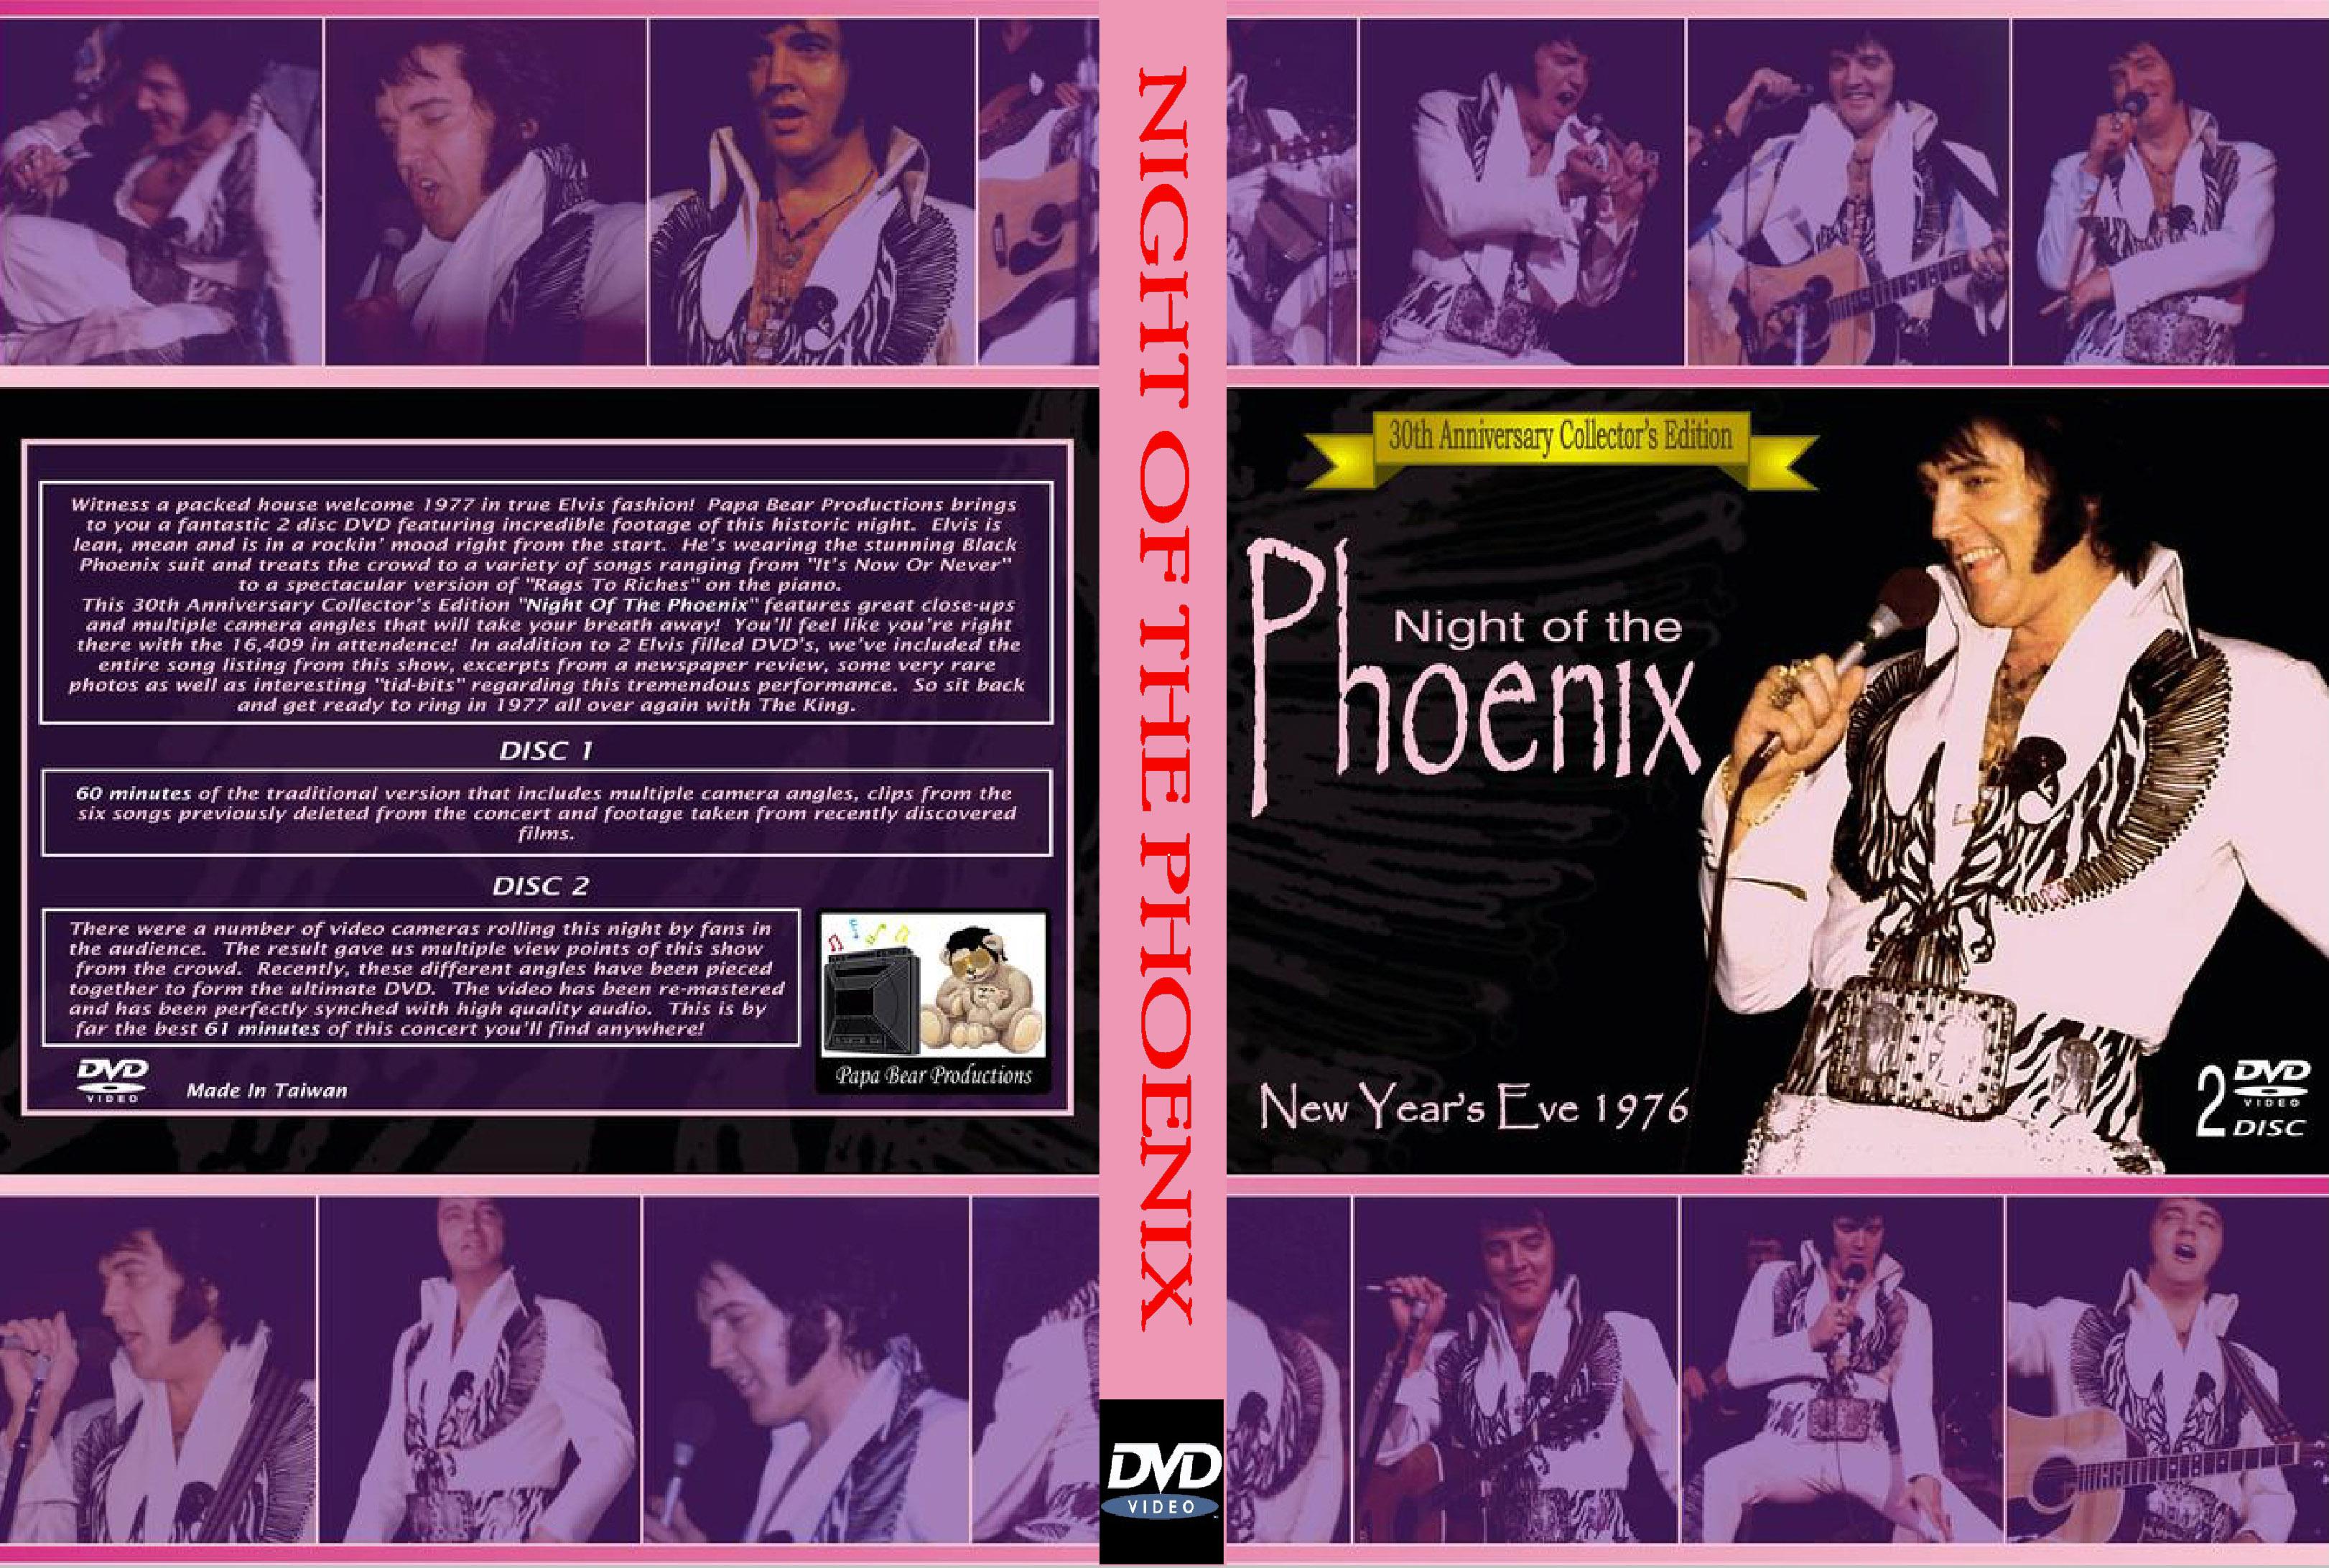 Resultado de imagem para Elvis in PITTSBURGH 76 dvd